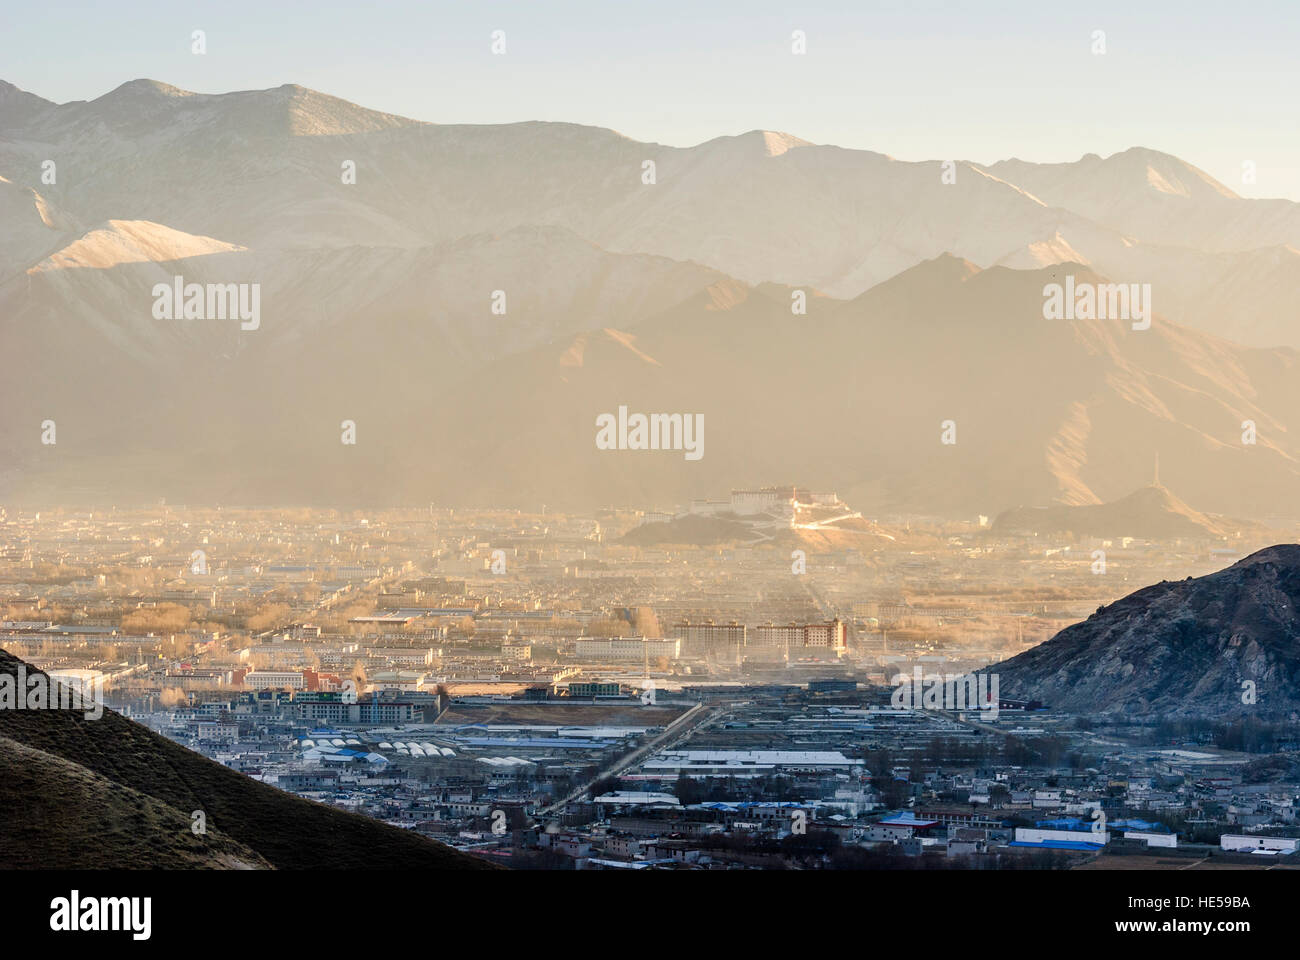 Lhasa: View of Lhasa with the Potala, Tibet, China - Stock Image